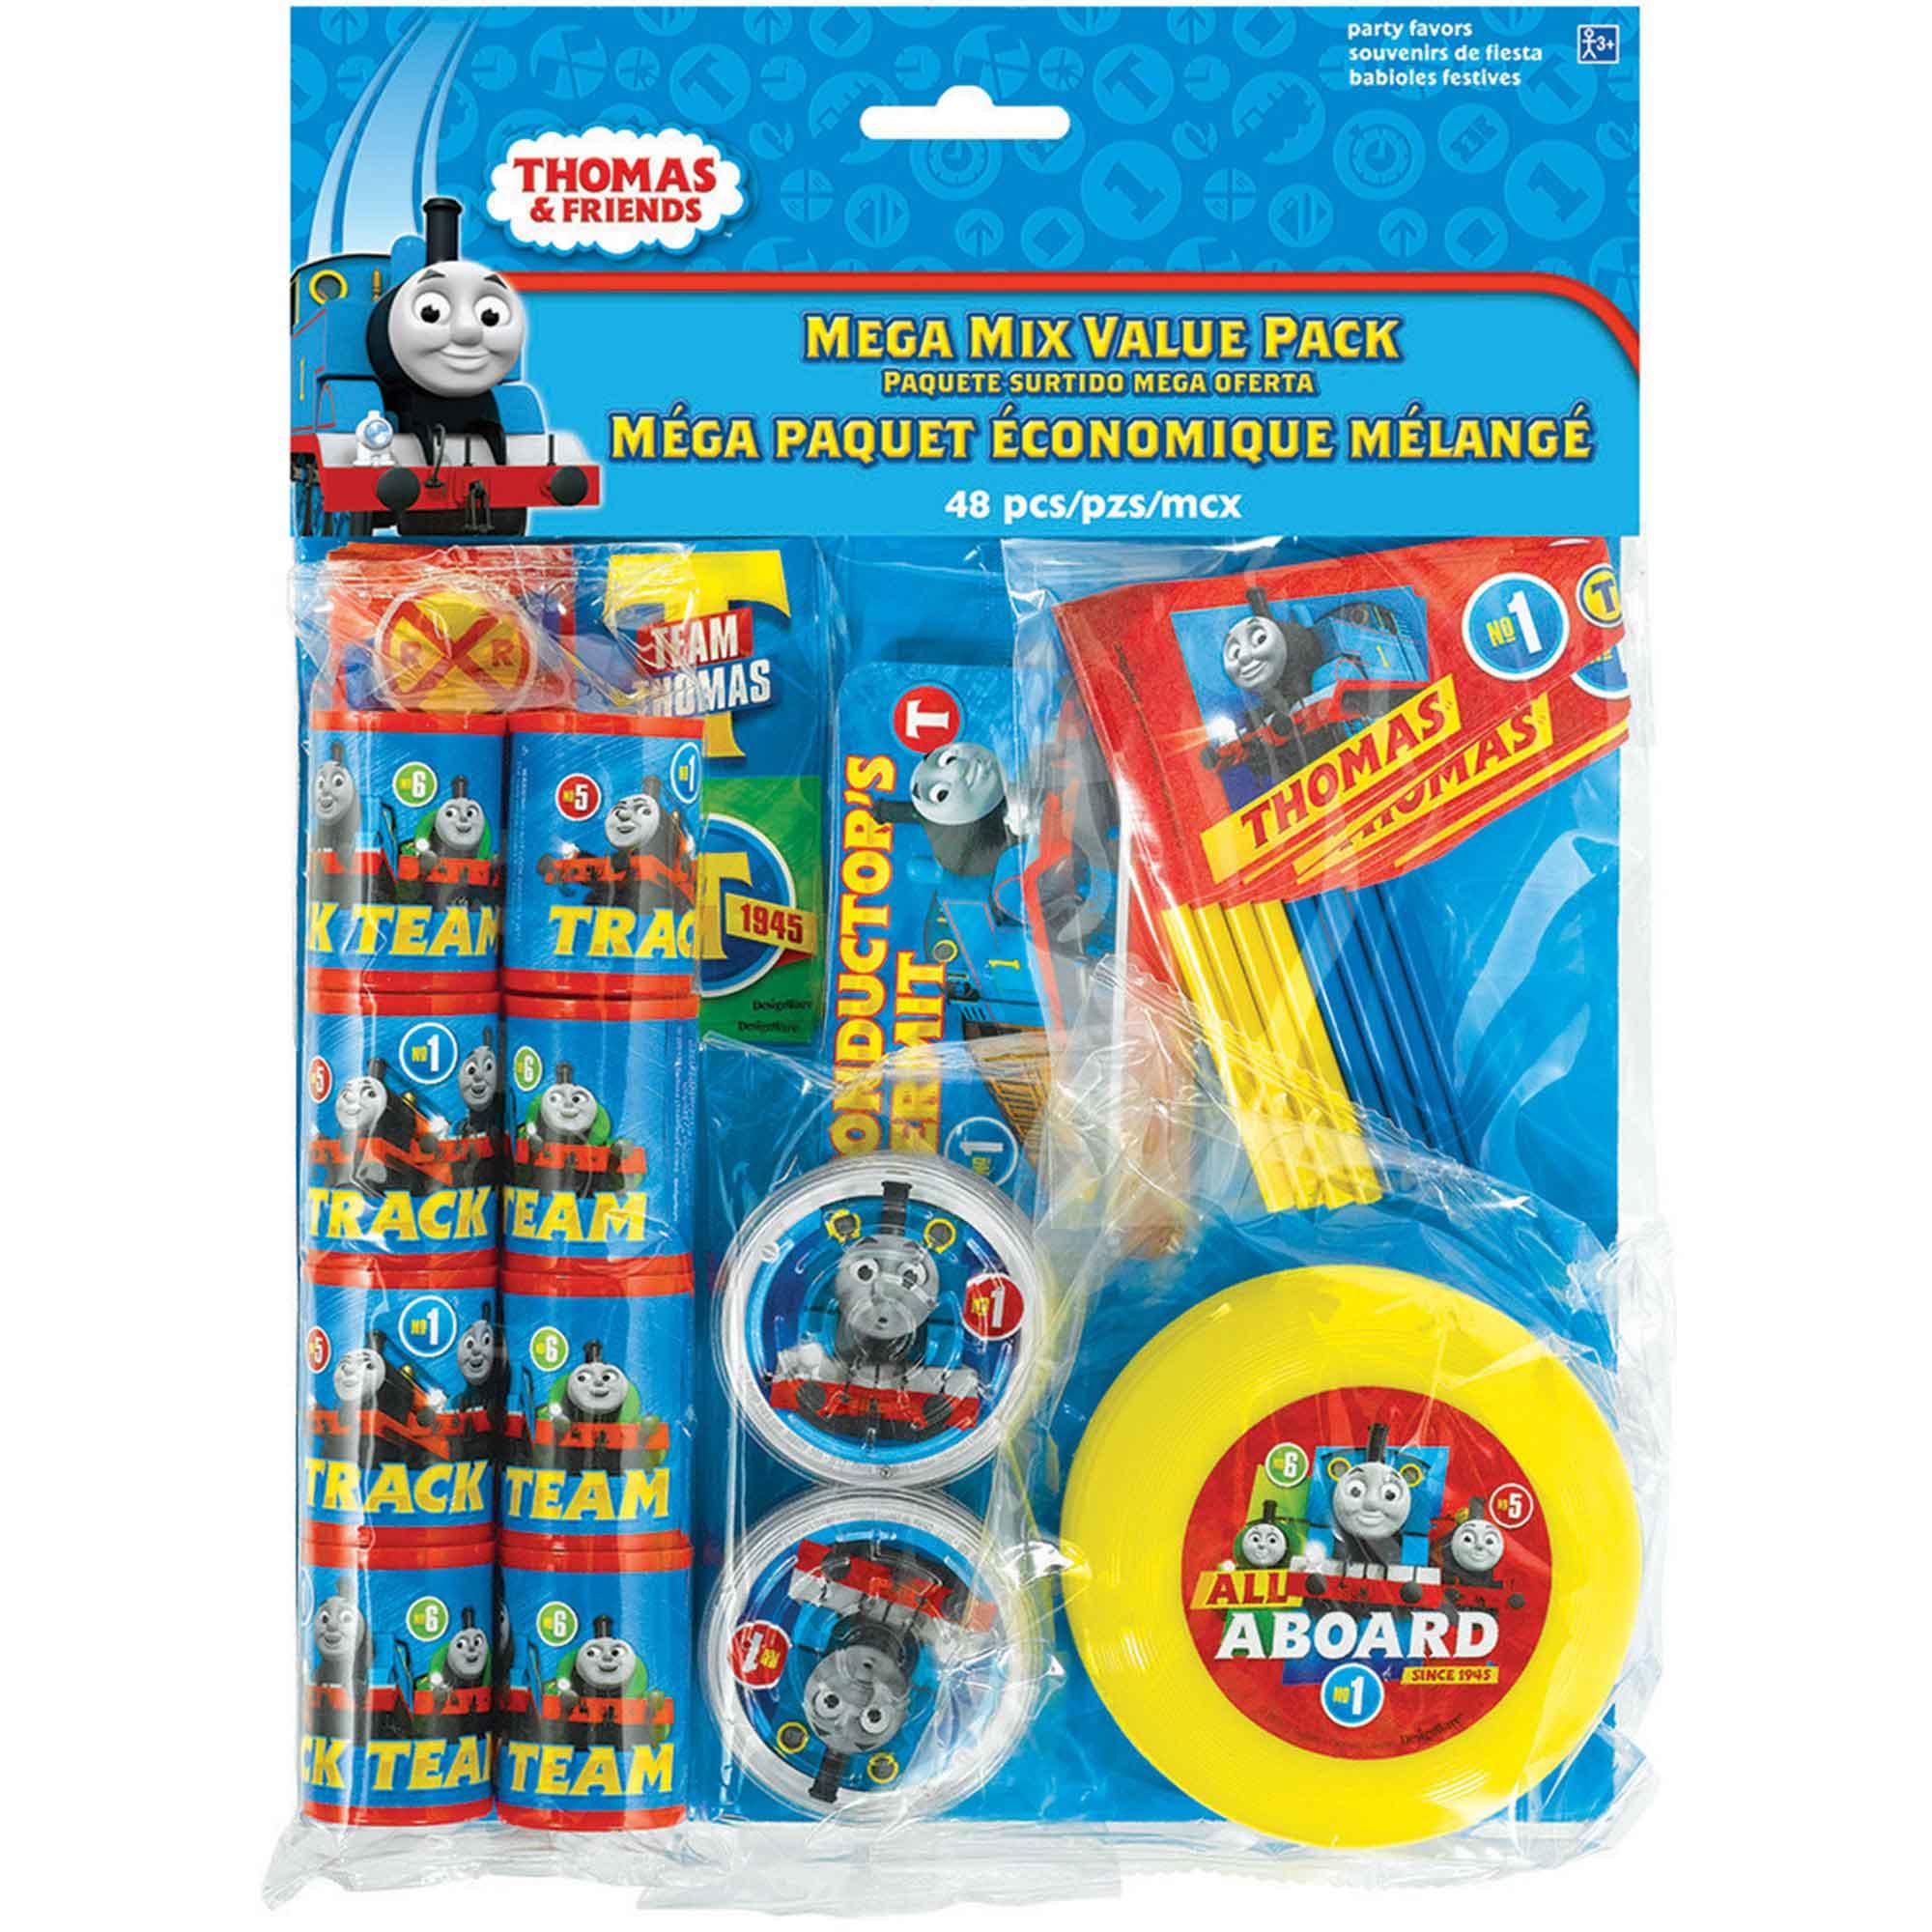 Thomas All Aboard Mega Mix Value Pack Favors